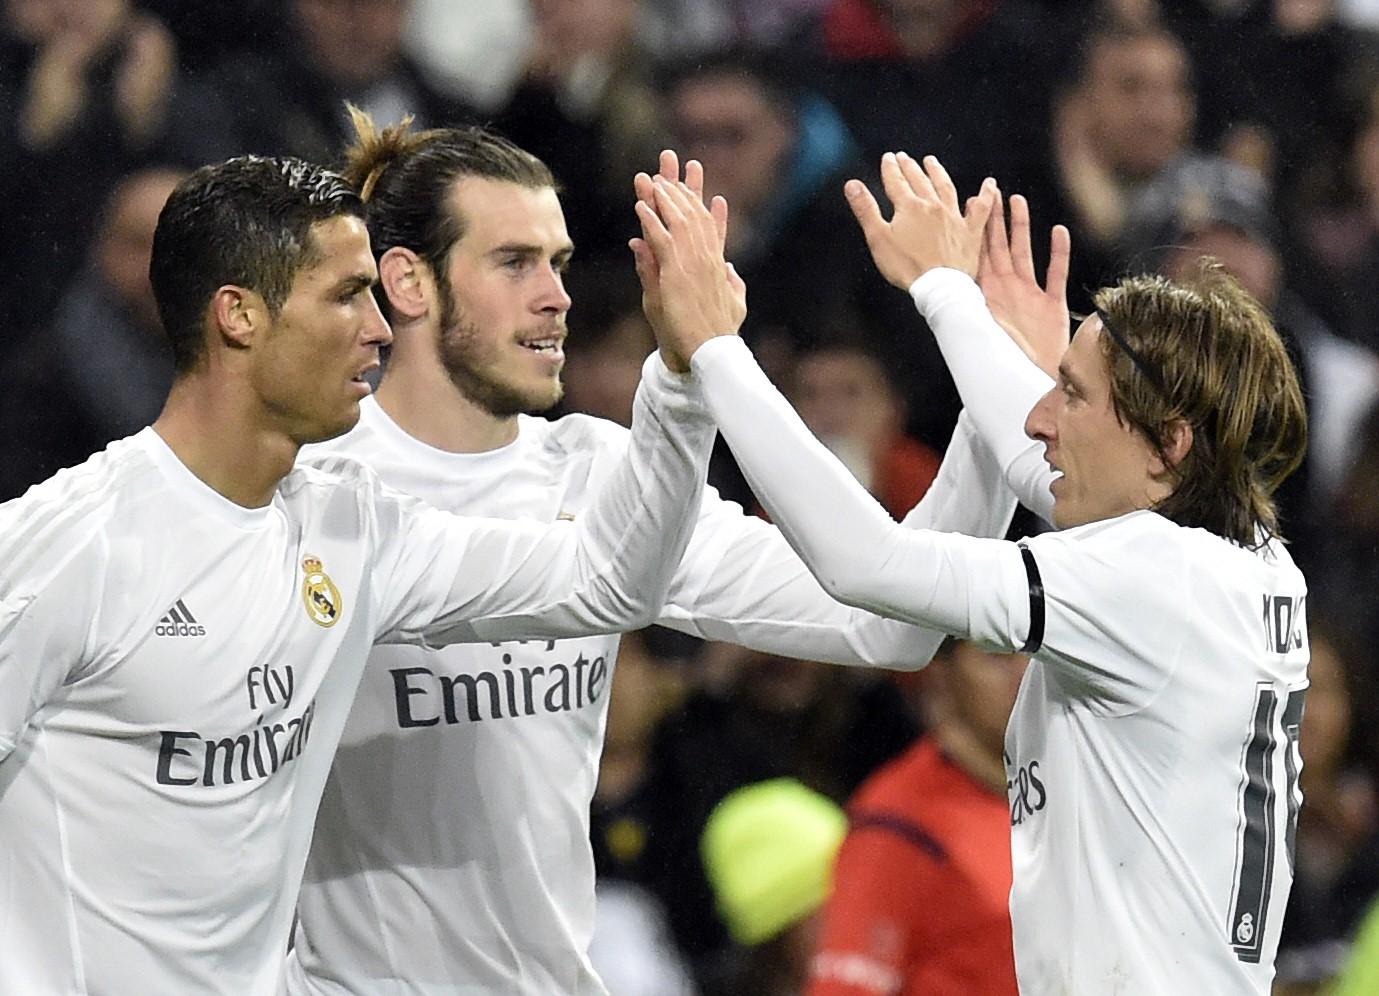 Cristiano Ronaldo und Luka Modric beglückwünschen Gareth Bale